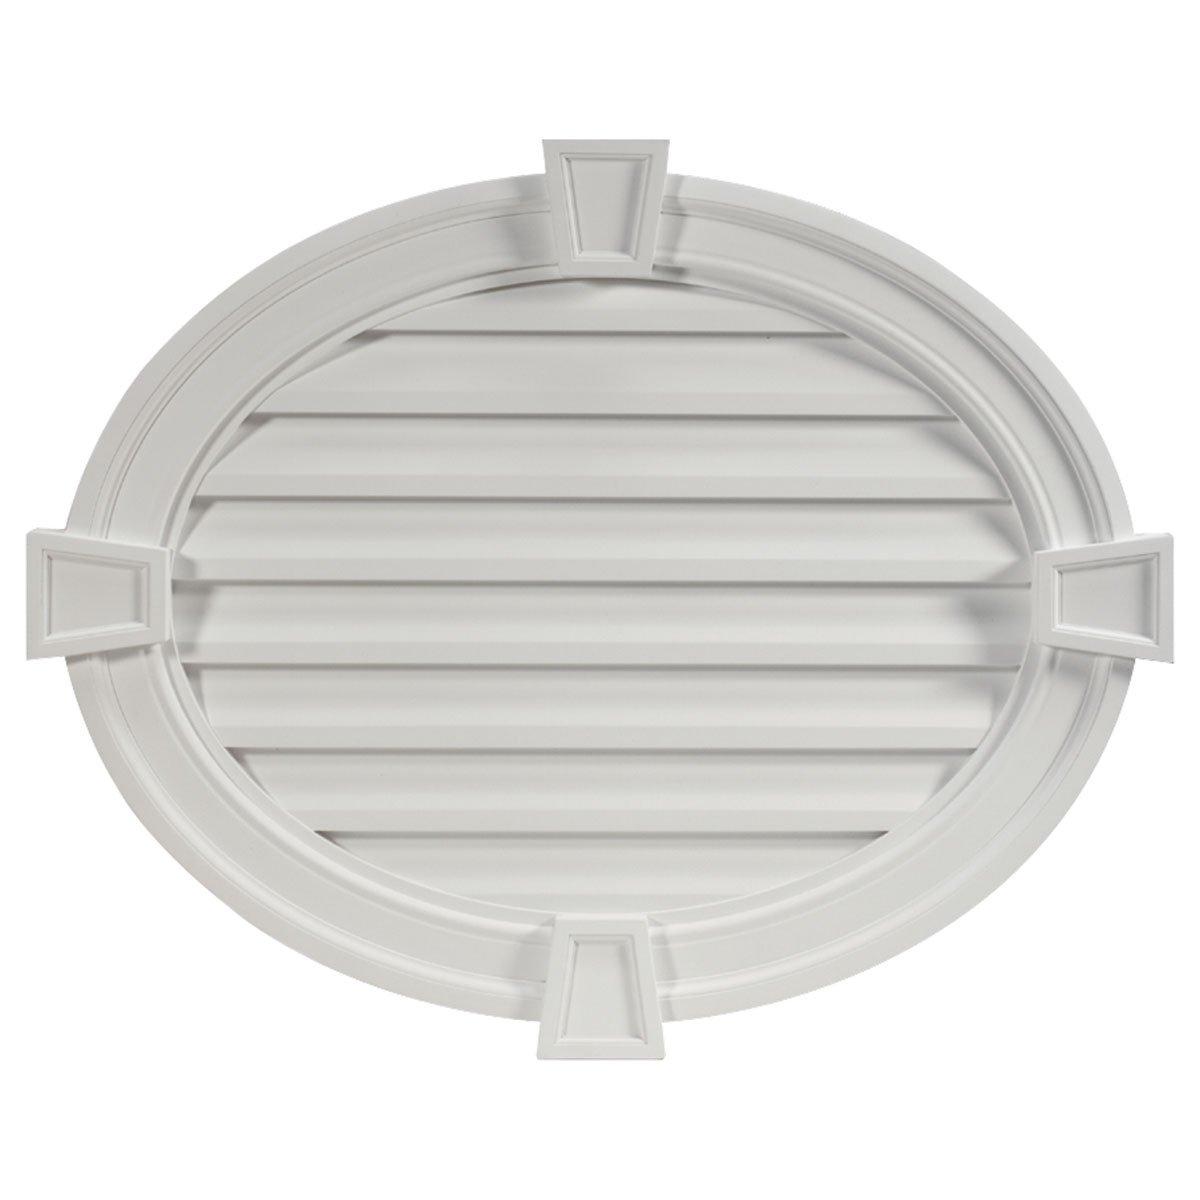 37 1/2''W x 30''H Horizontal Oval Louver, with Decorative Trim and Keystones, Decorative